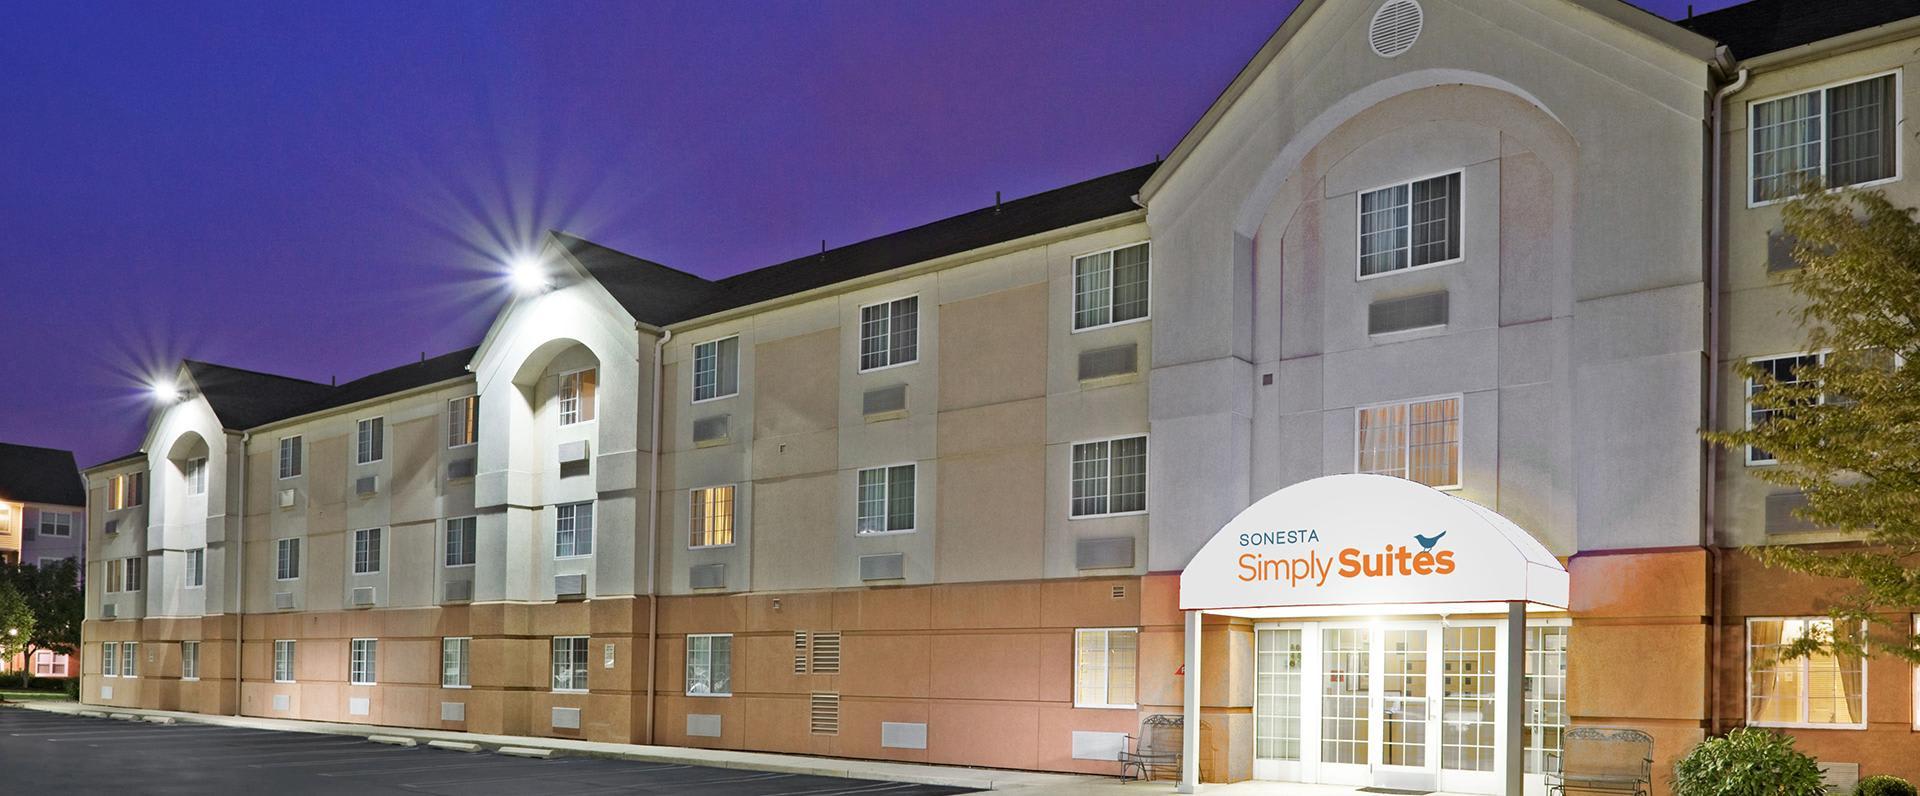 Simply Suites exterior